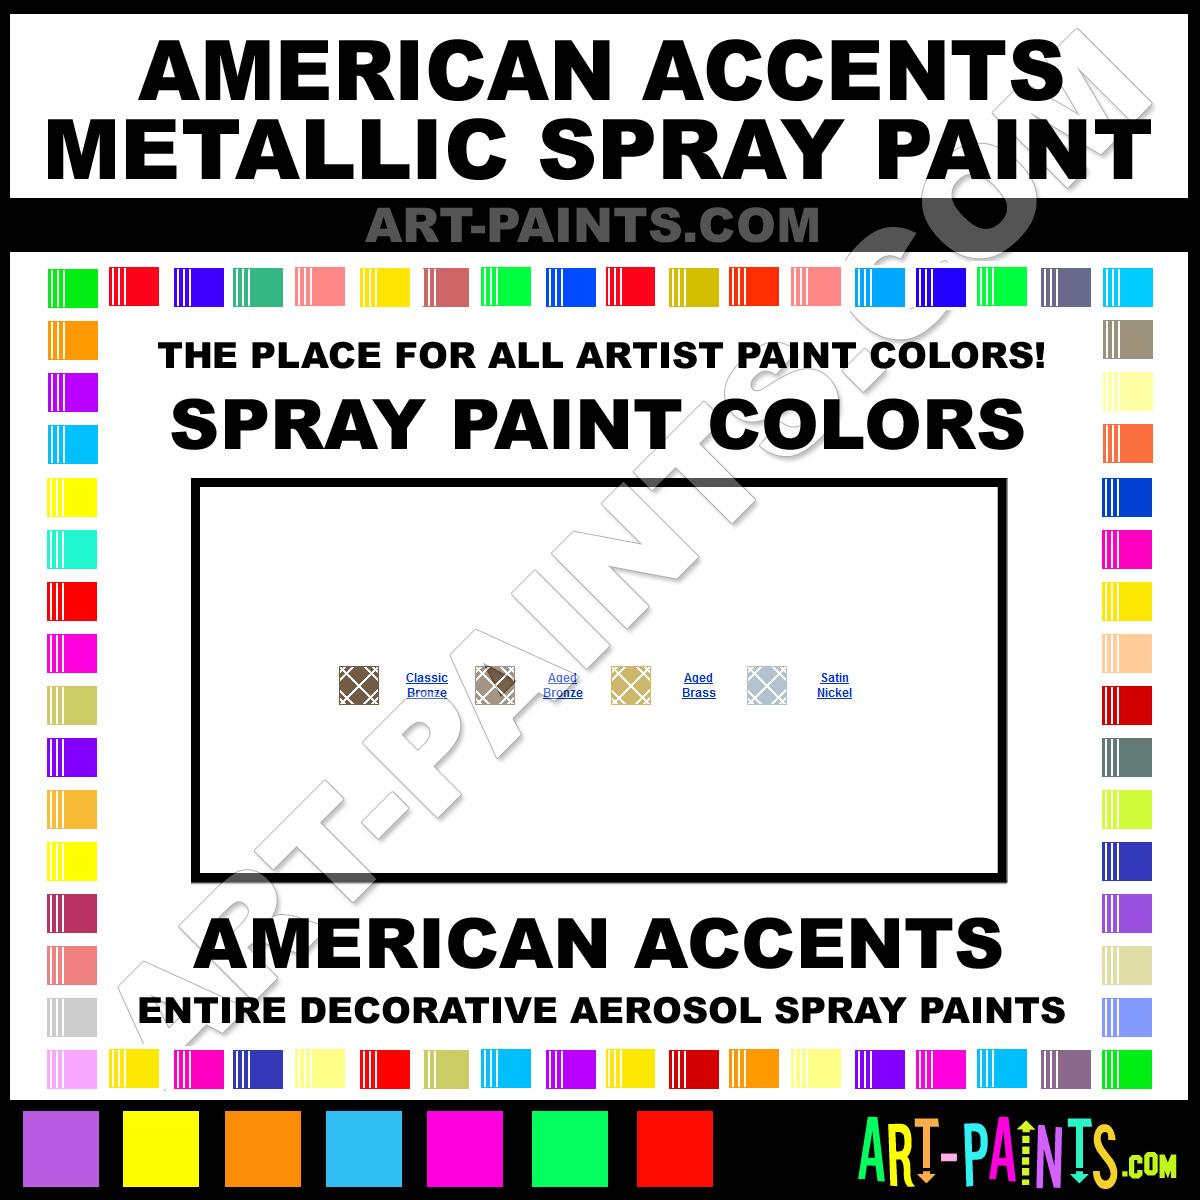 Colour chart for car paint - Car Paint Color Chart Candy Colors Satin Nickel Metallic Spray Paints243896satin Nickel Paint